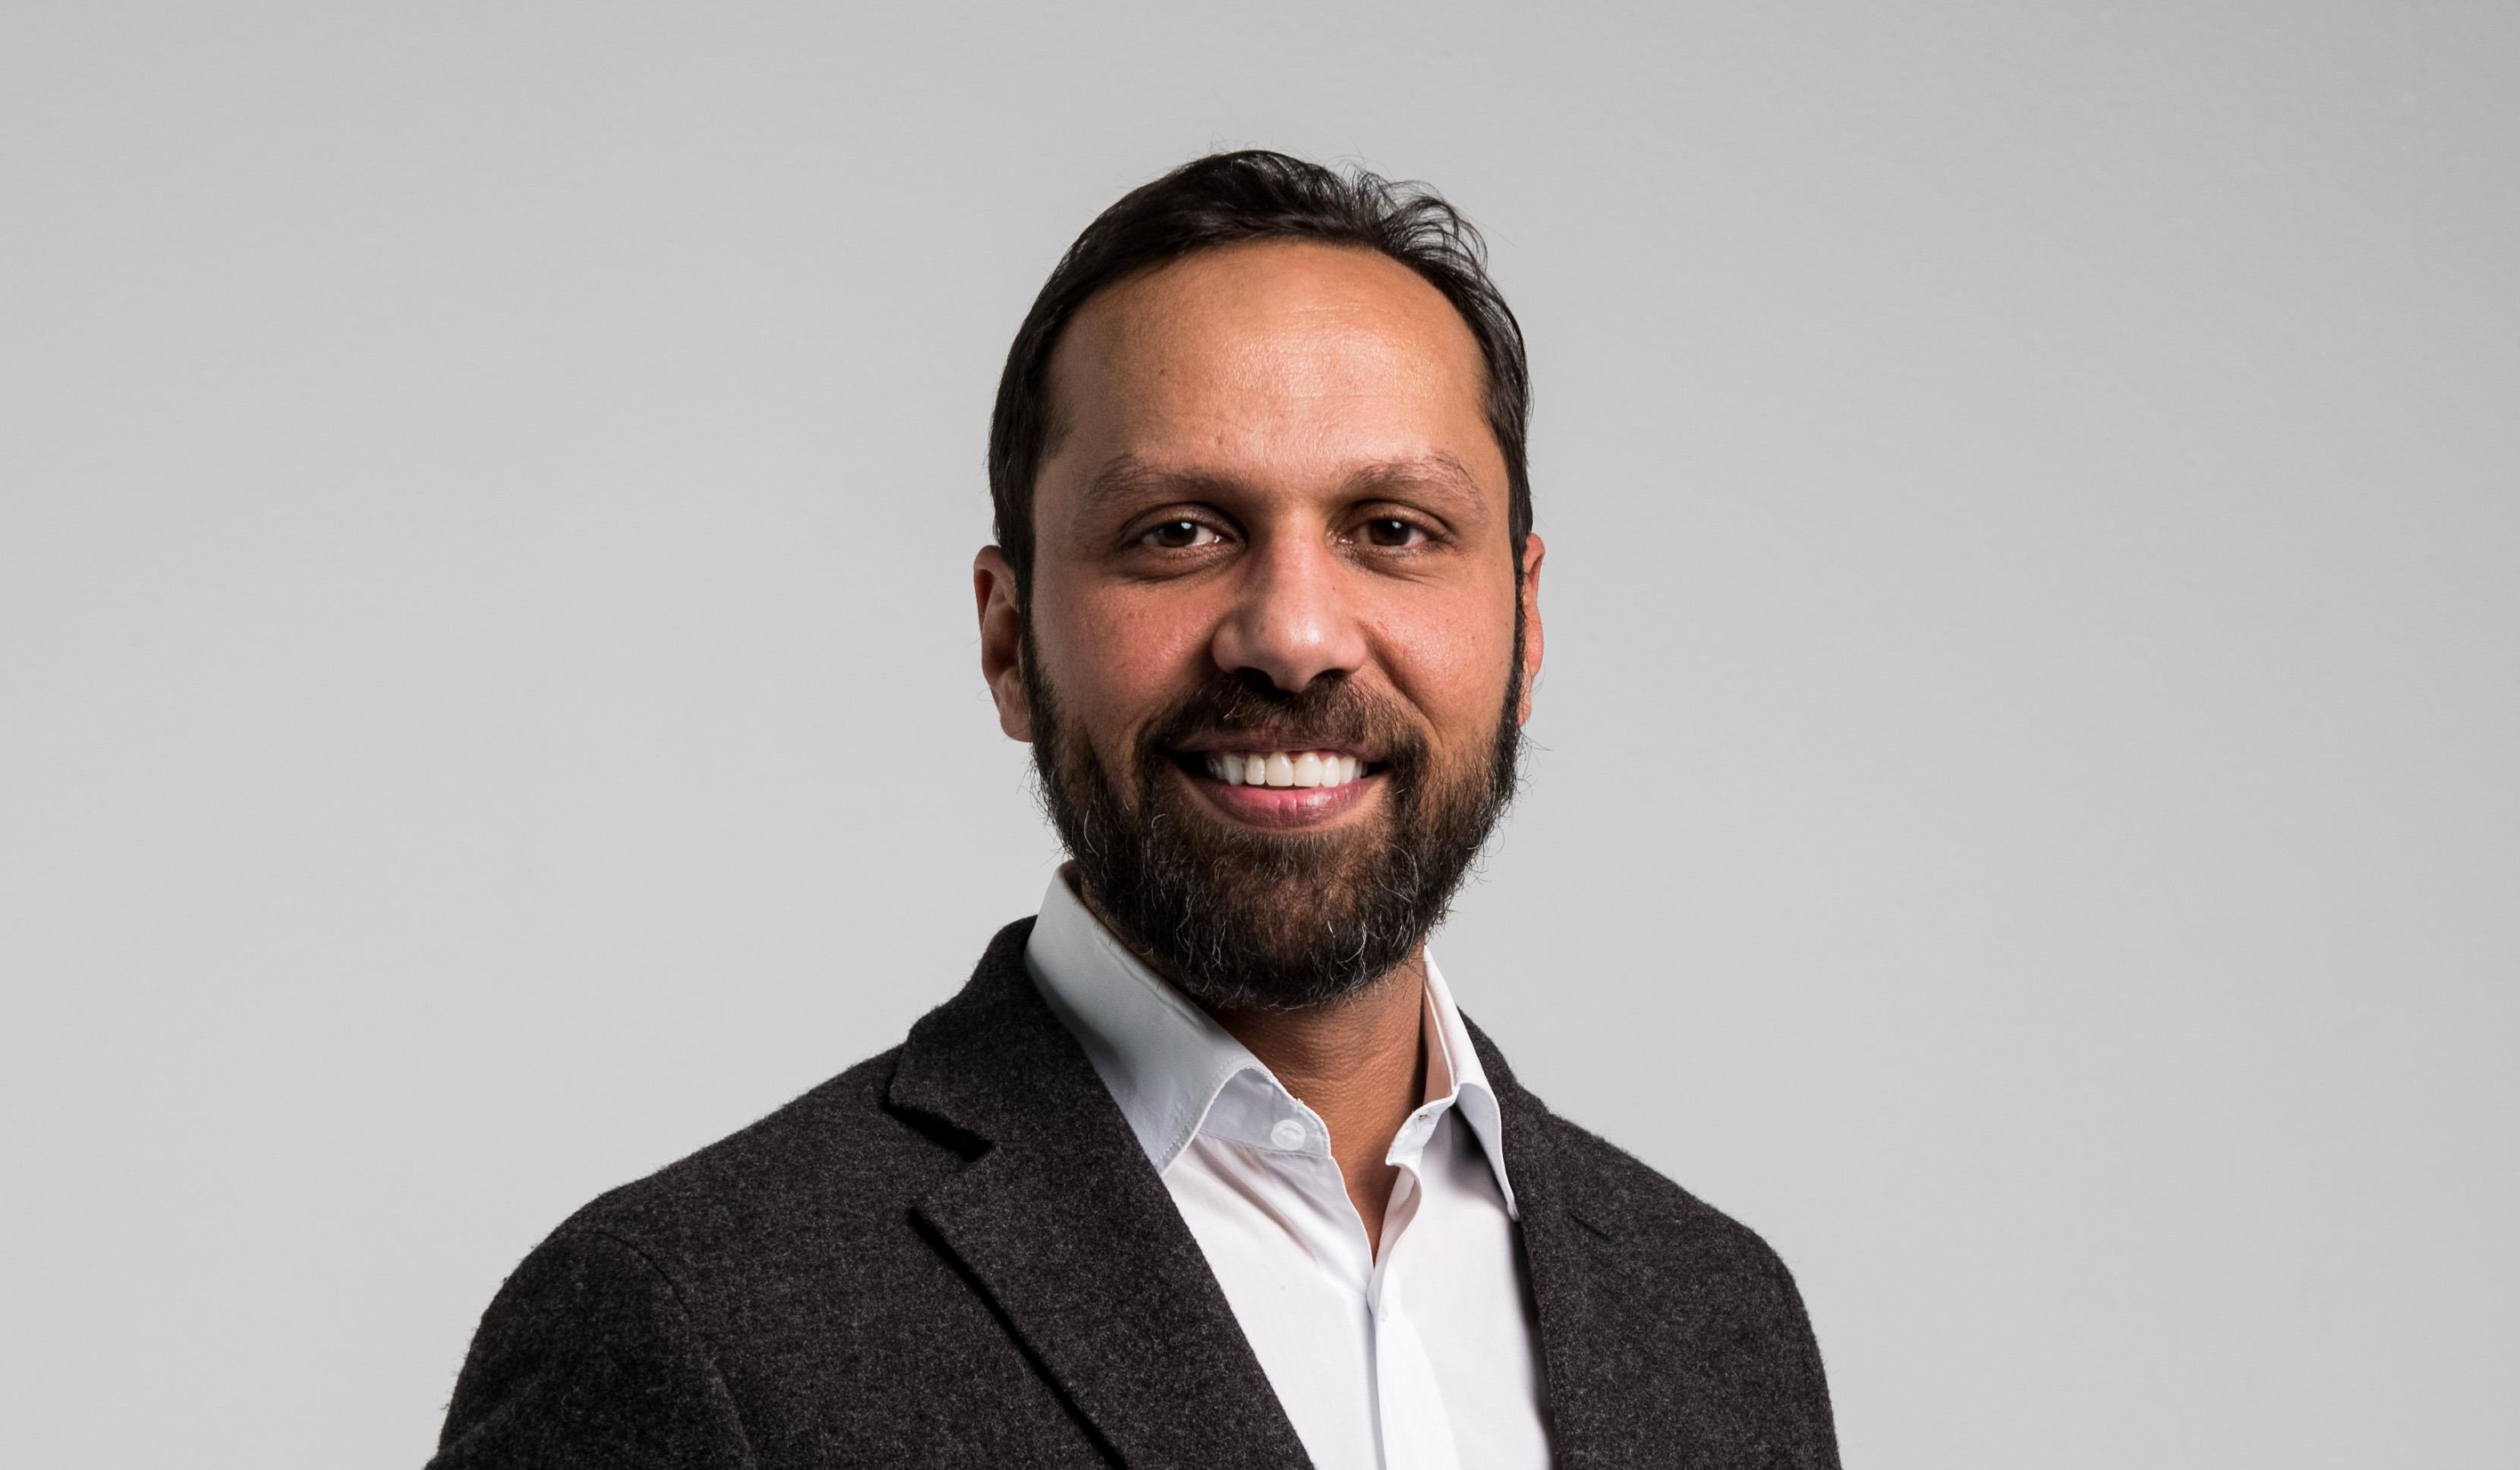 Ashraf Samy, Chief Corporate Officer at CEQUENS